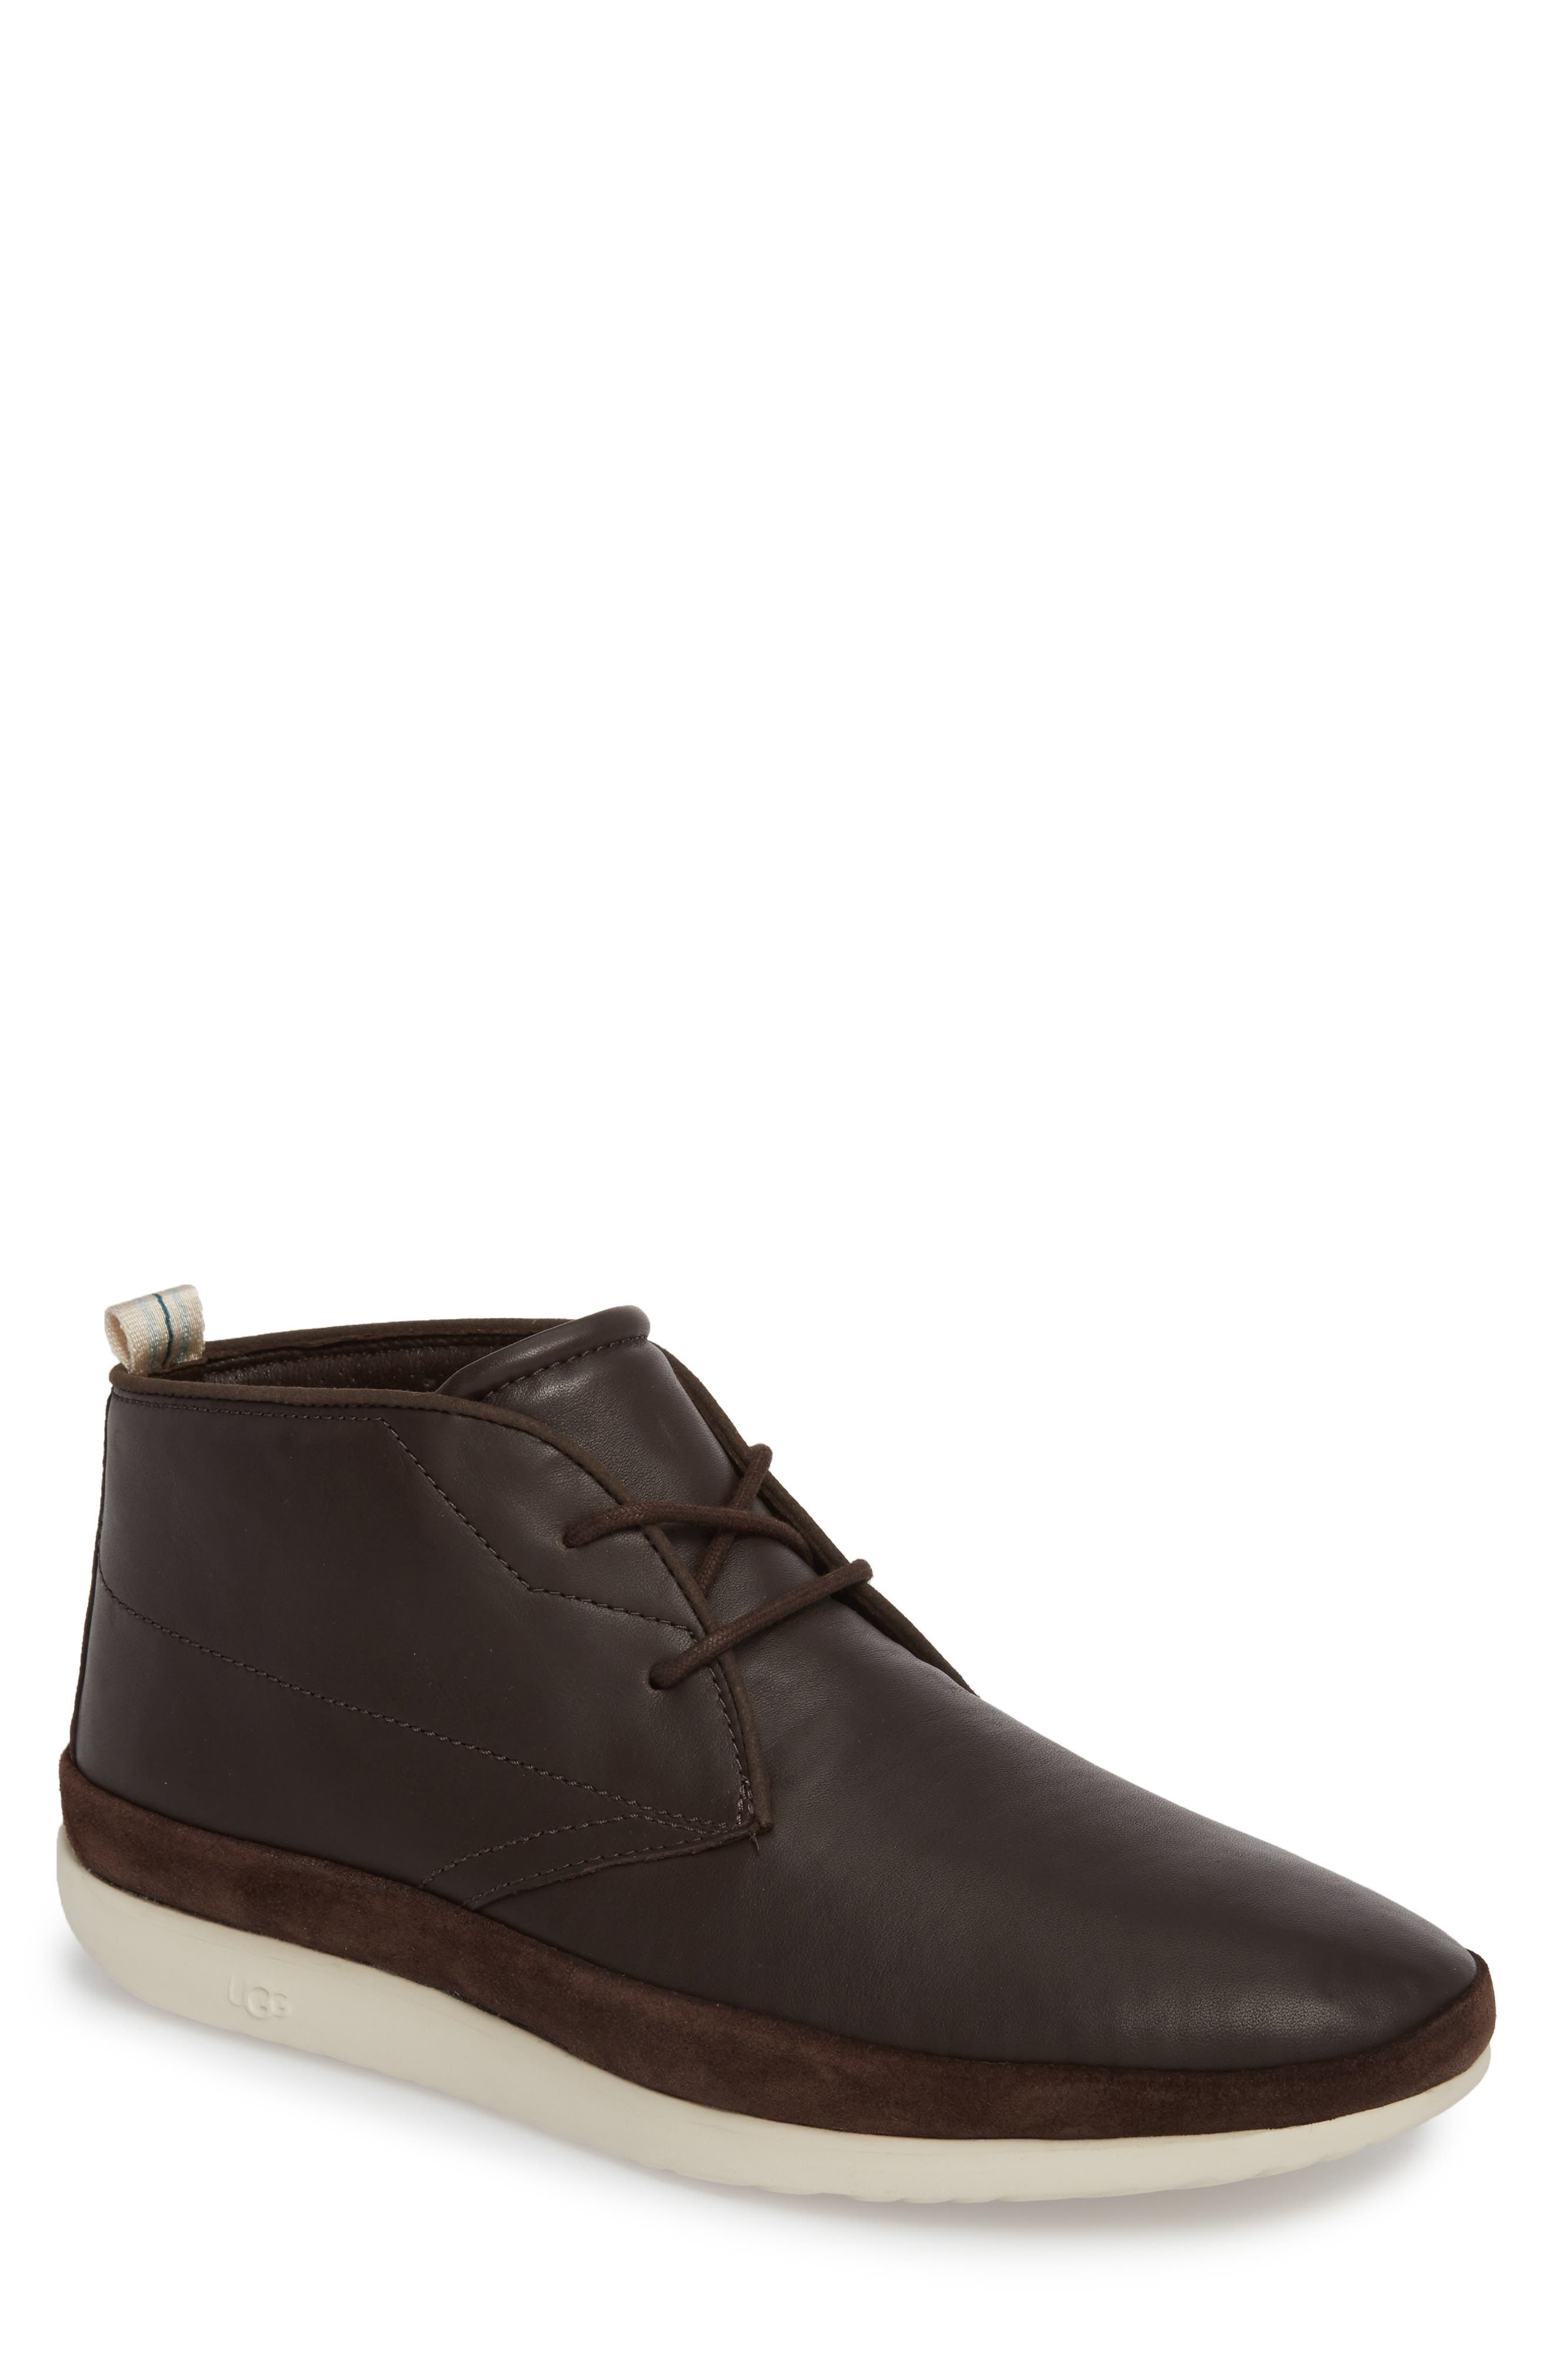 Cali Chukka Boot,                             Main thumbnail 1, color,                             Stout Leather